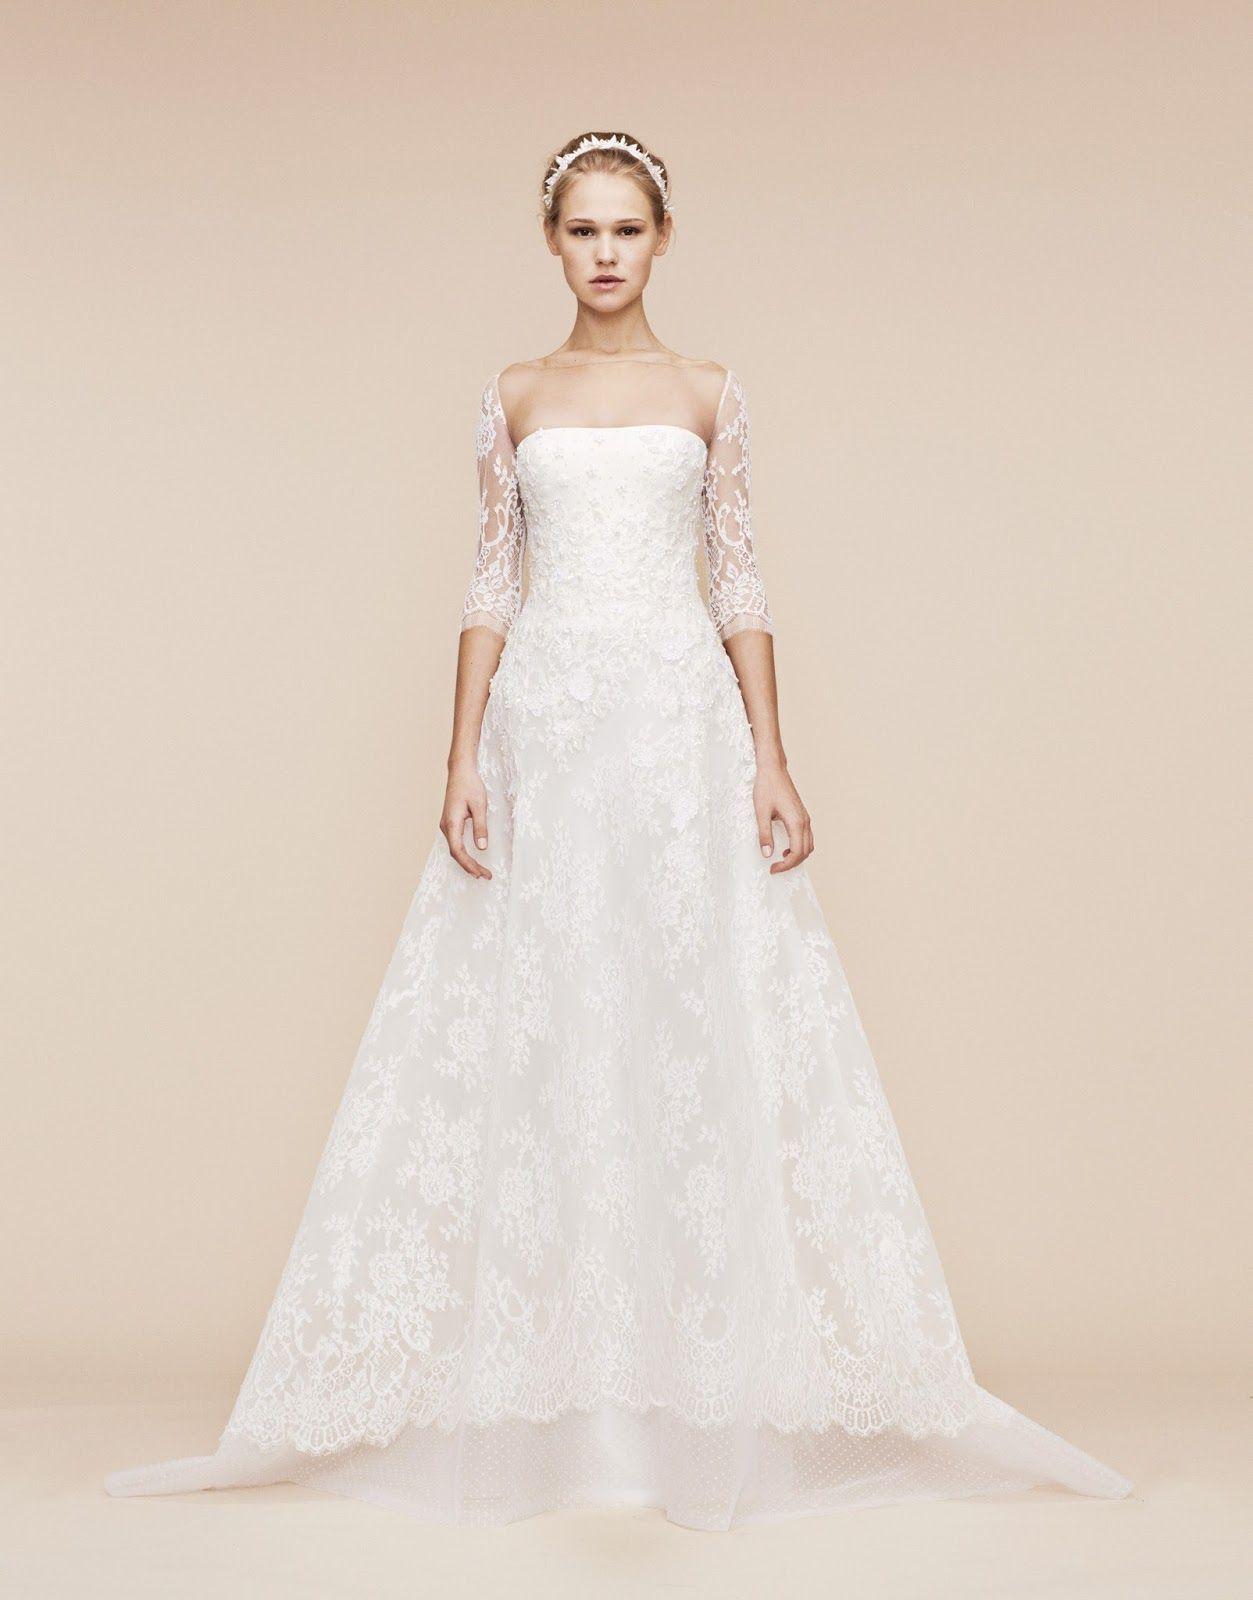 Bridal beautiful georges hobeika zsazsa bellagio like no other